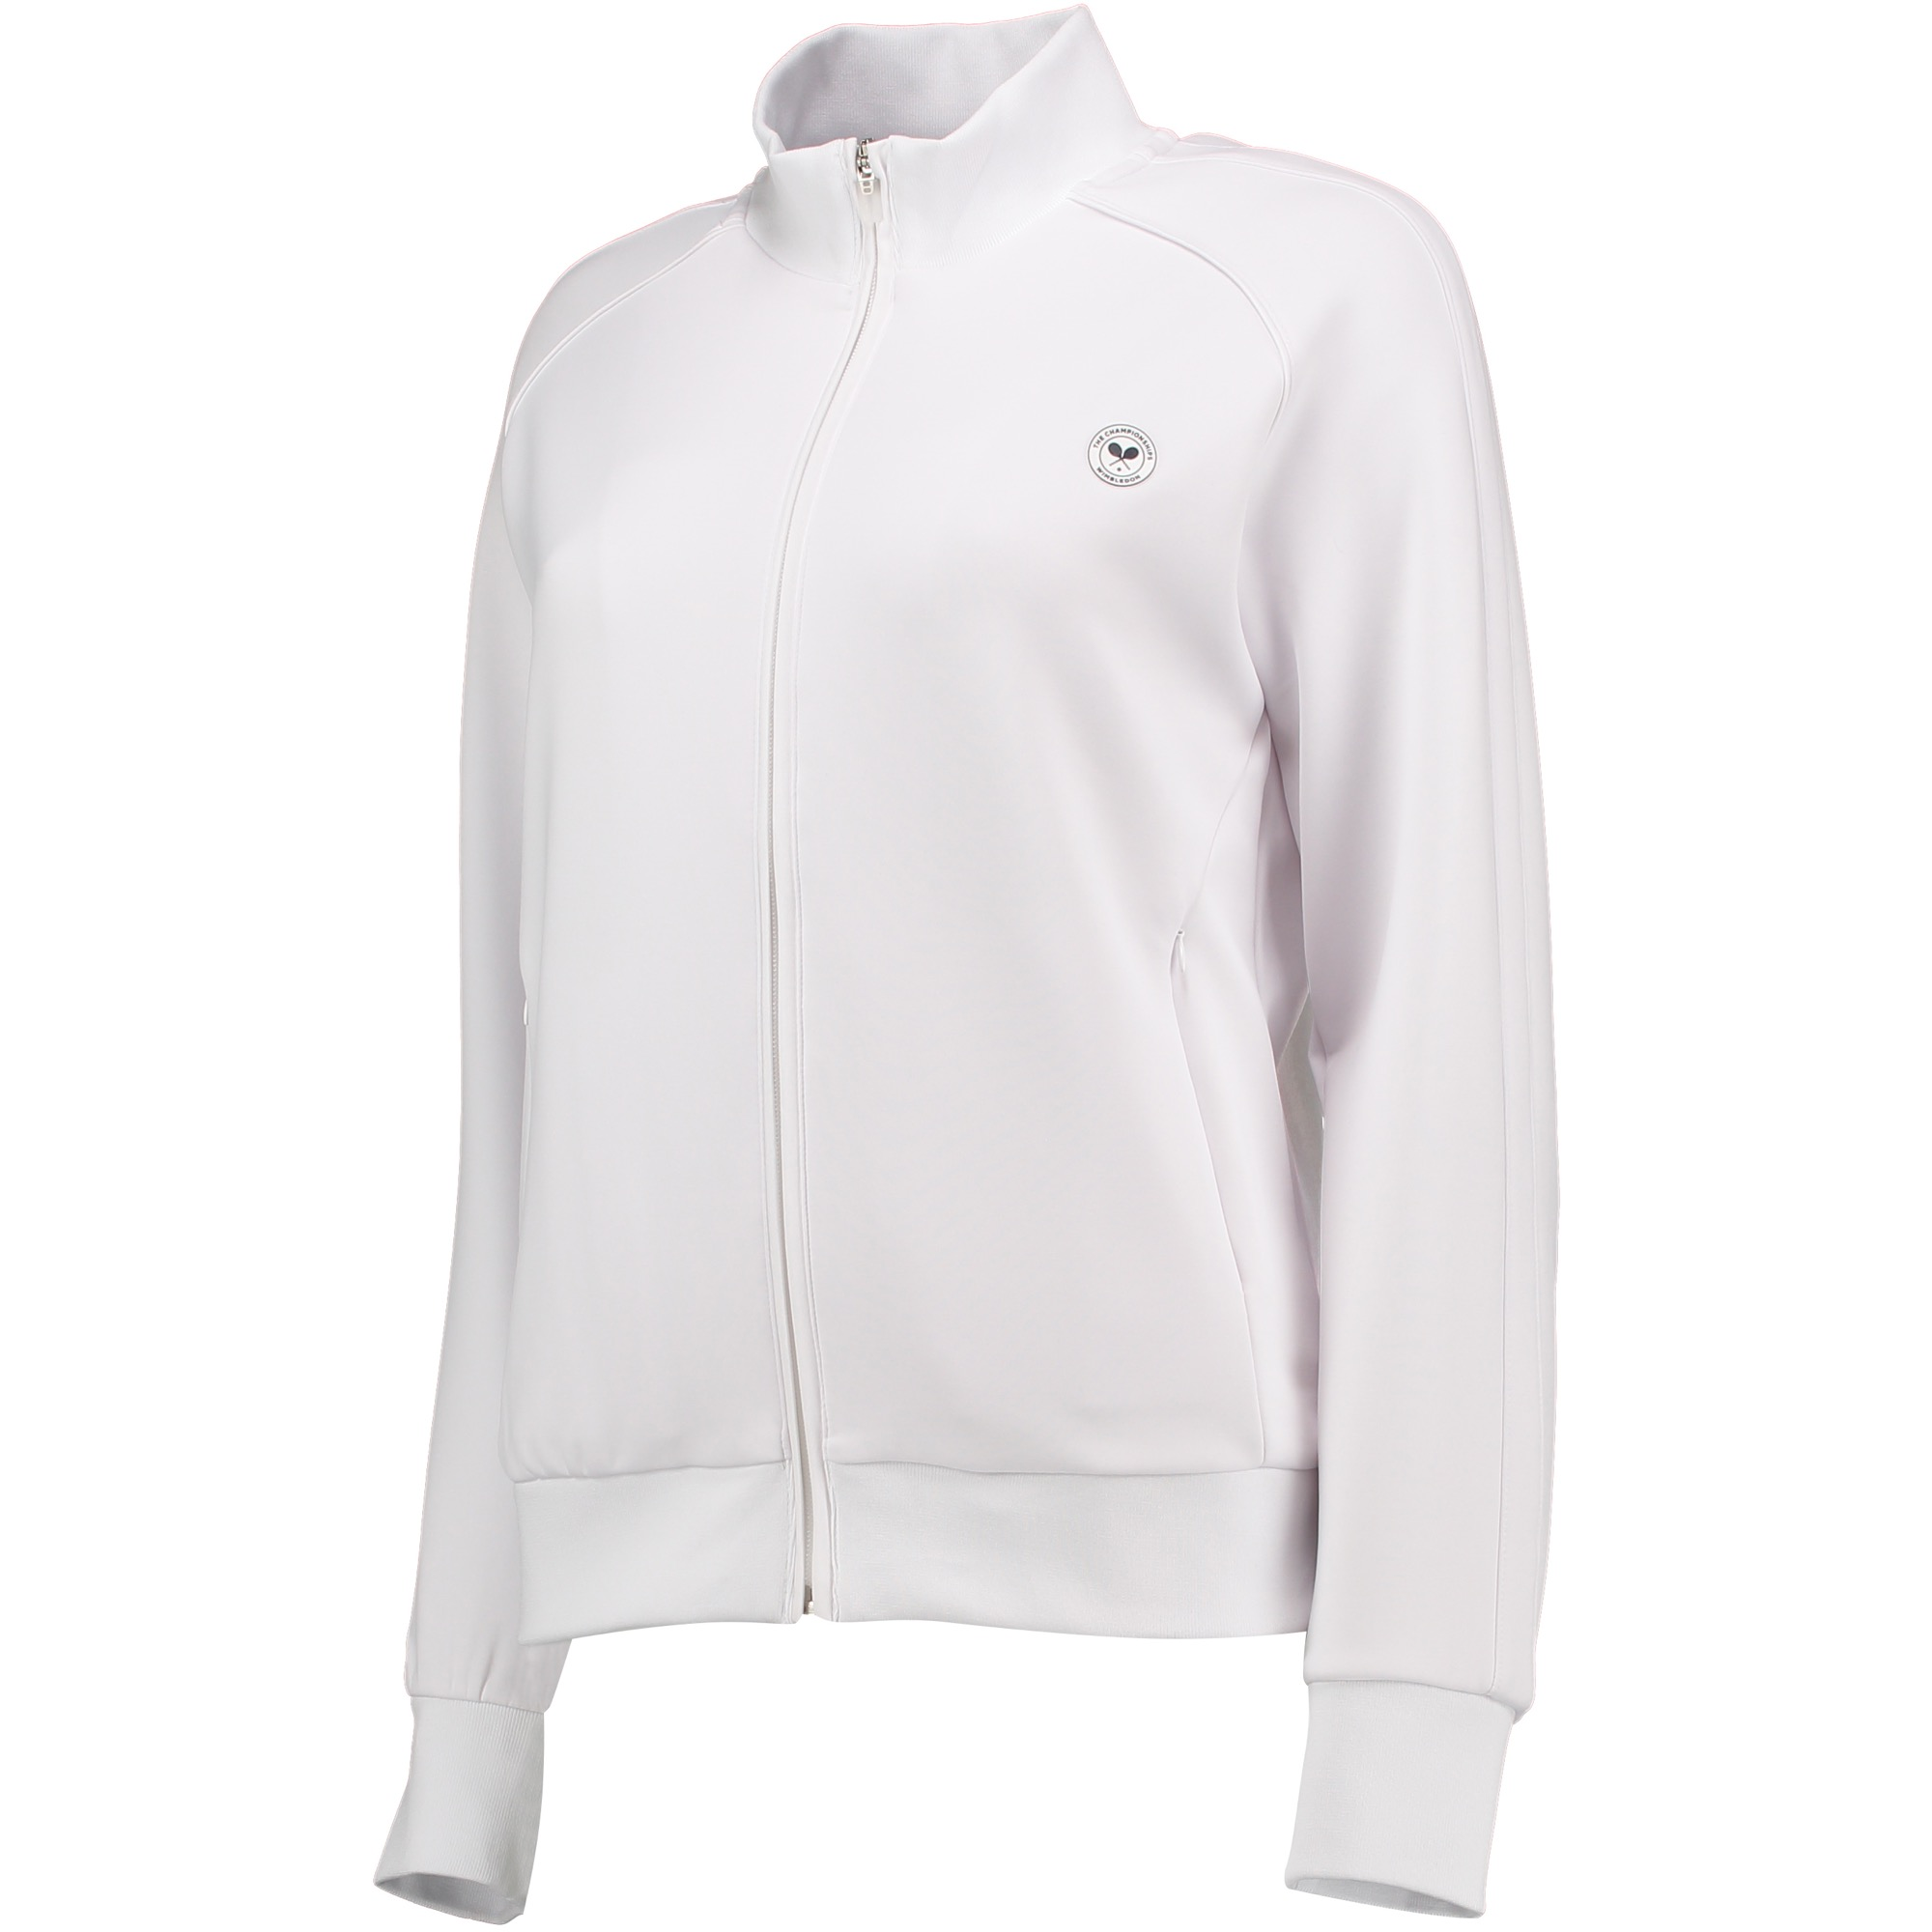 Wimbledon Technical Zip ThroughTop - White - Ladies